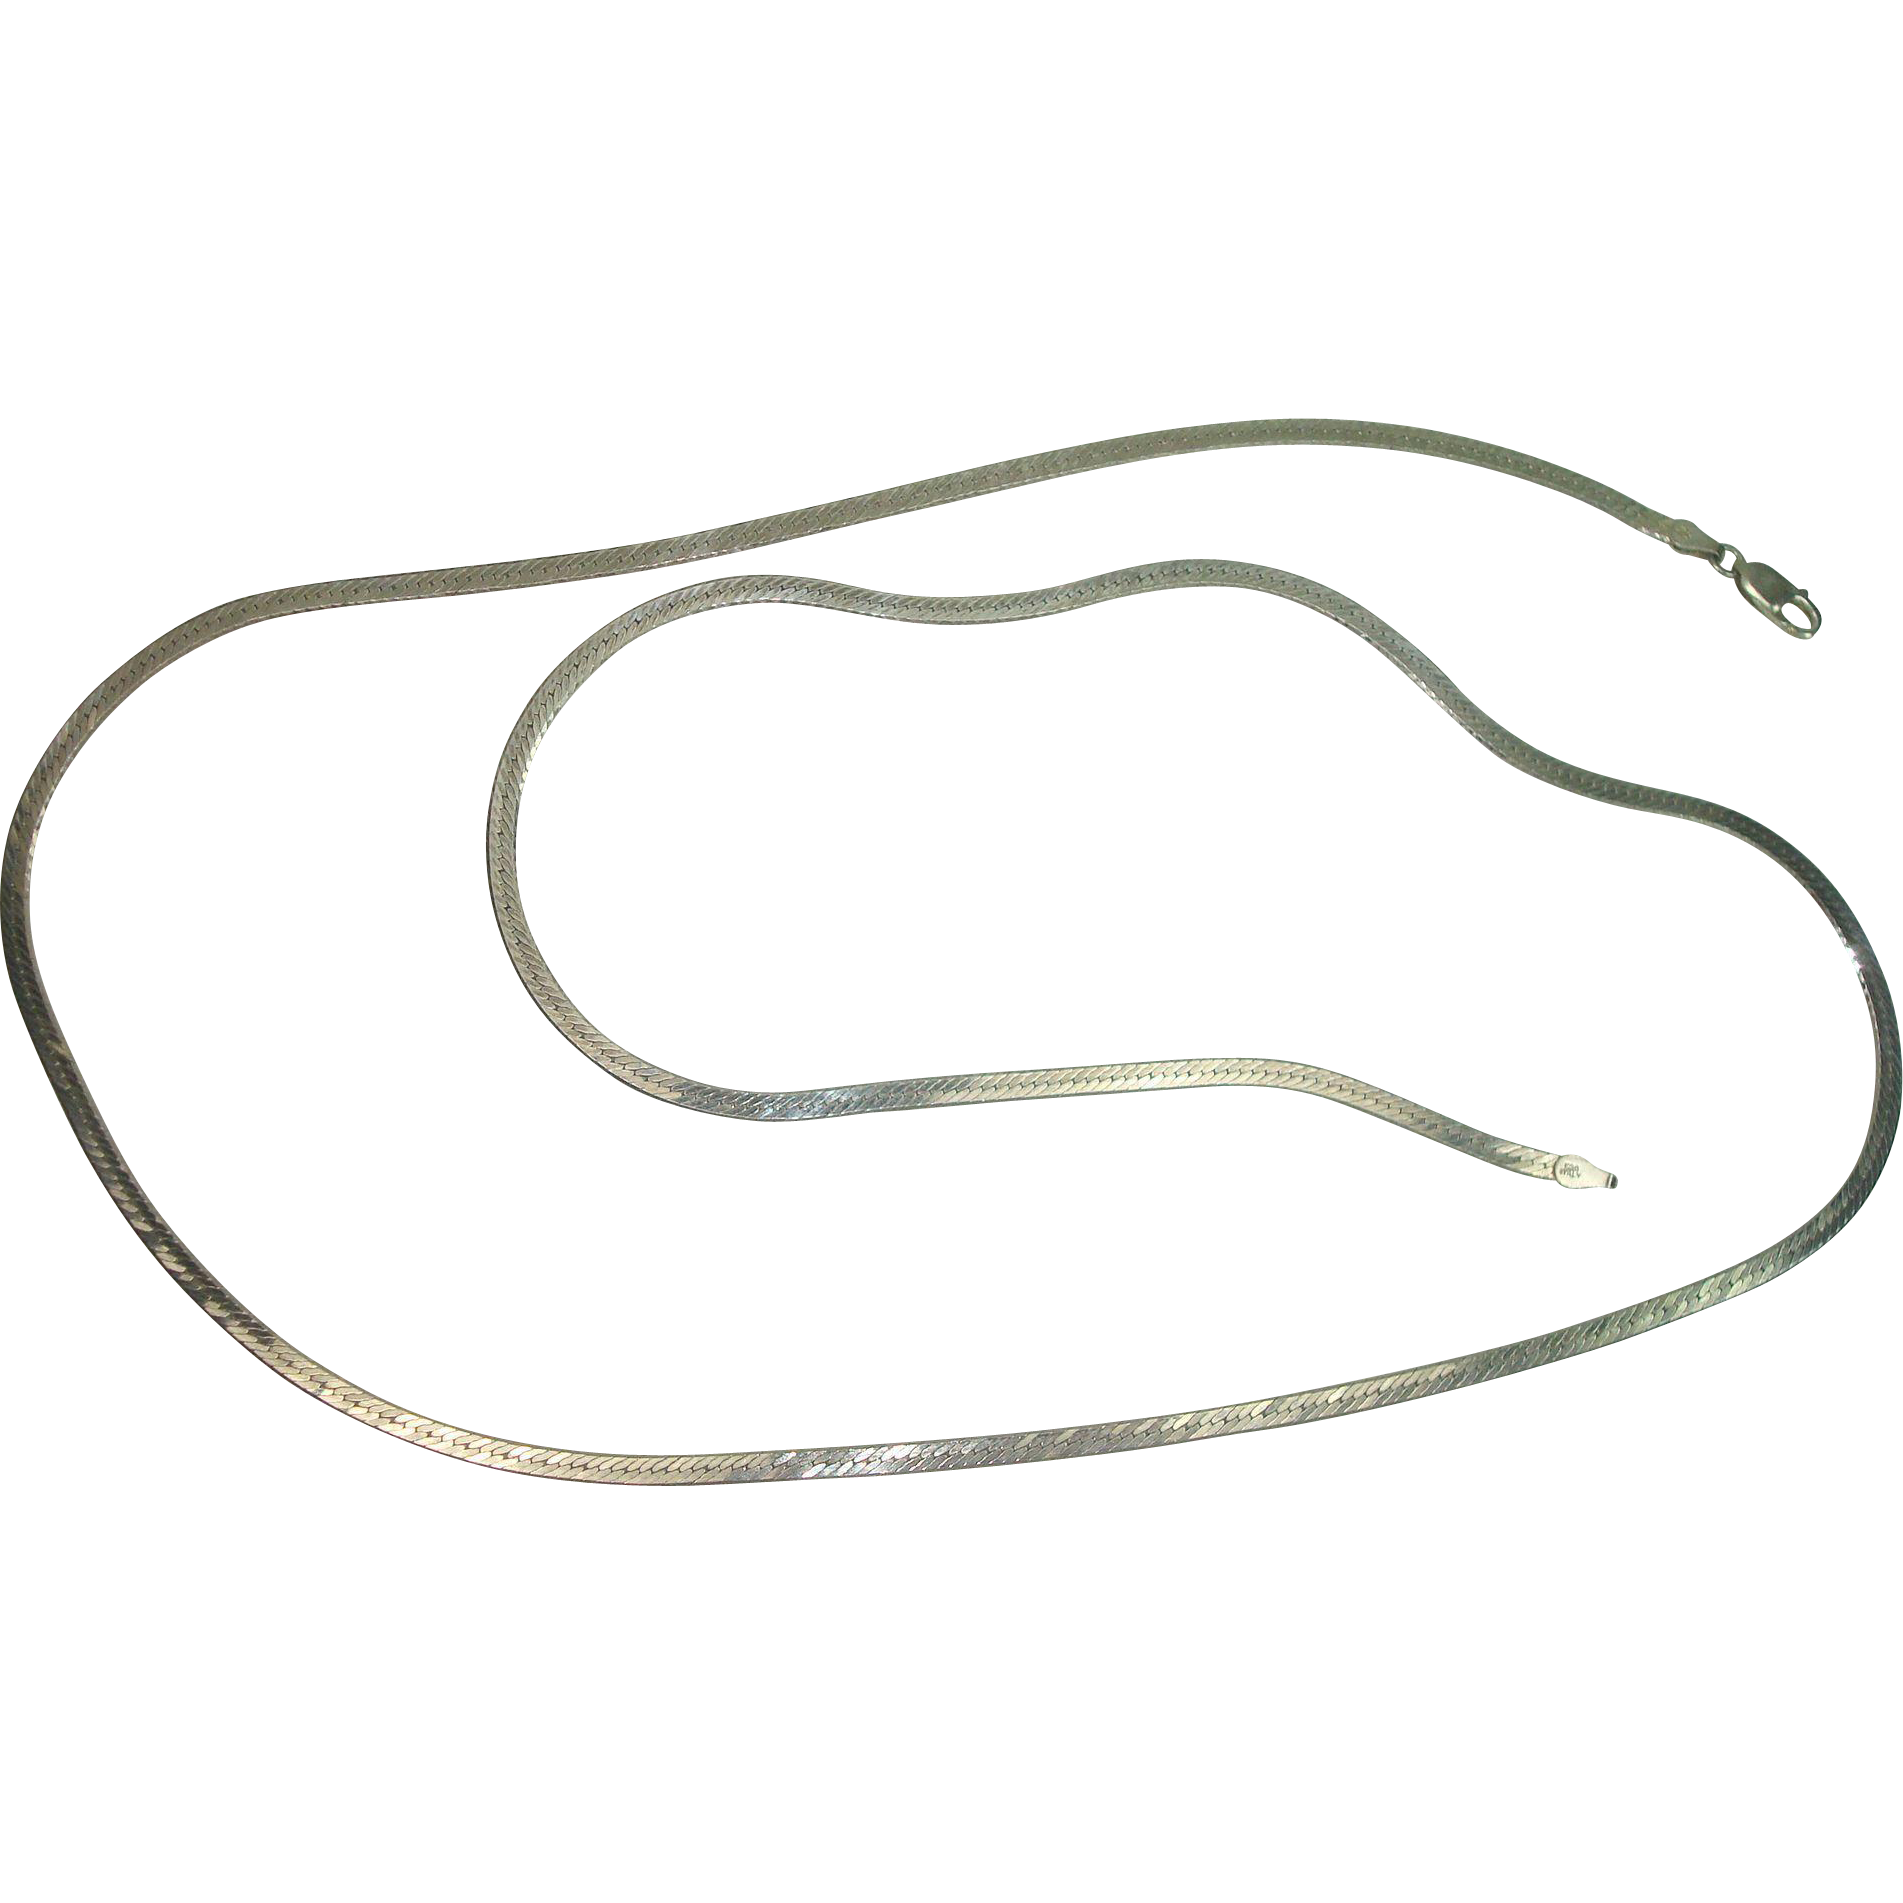 "Italian Sterling 30"" Herringbone Necklace"